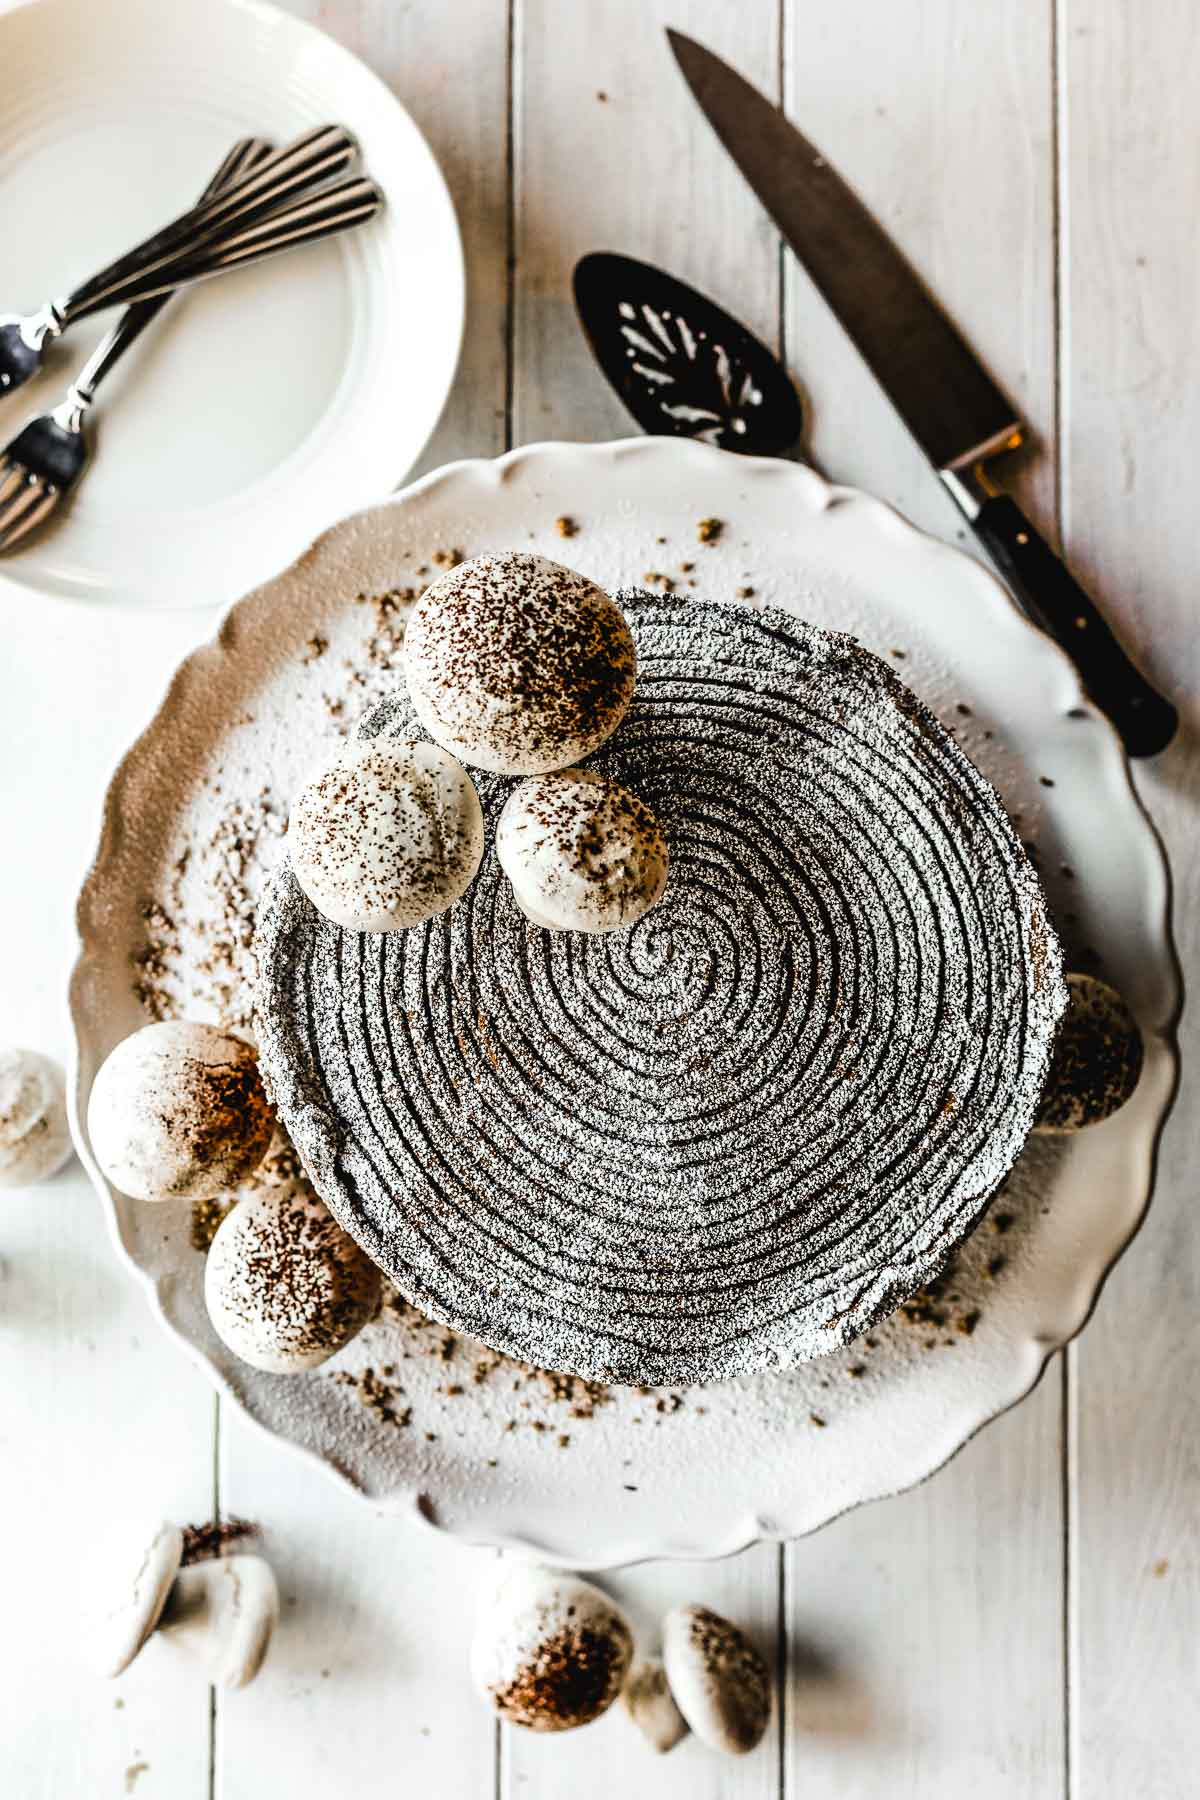 Assembling a chocolate hazelnut buche de noel cake